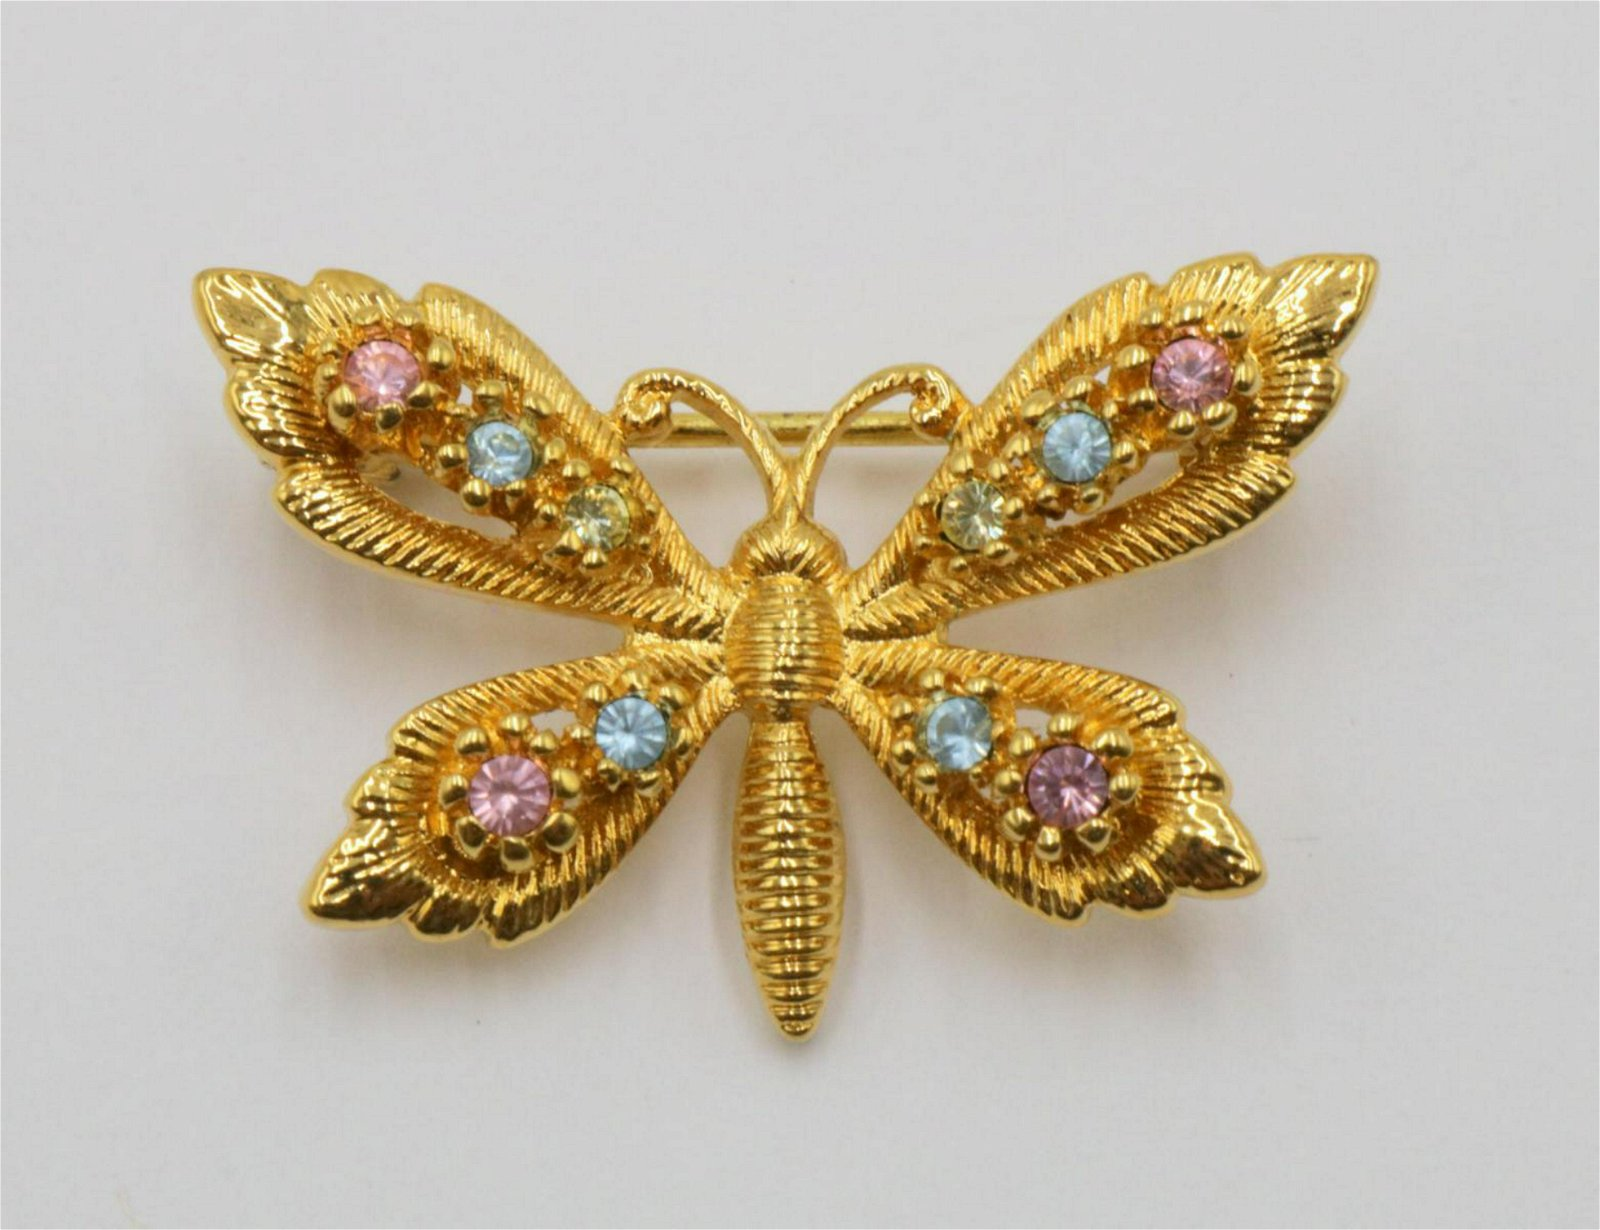 Swarovski Butterfly Pin